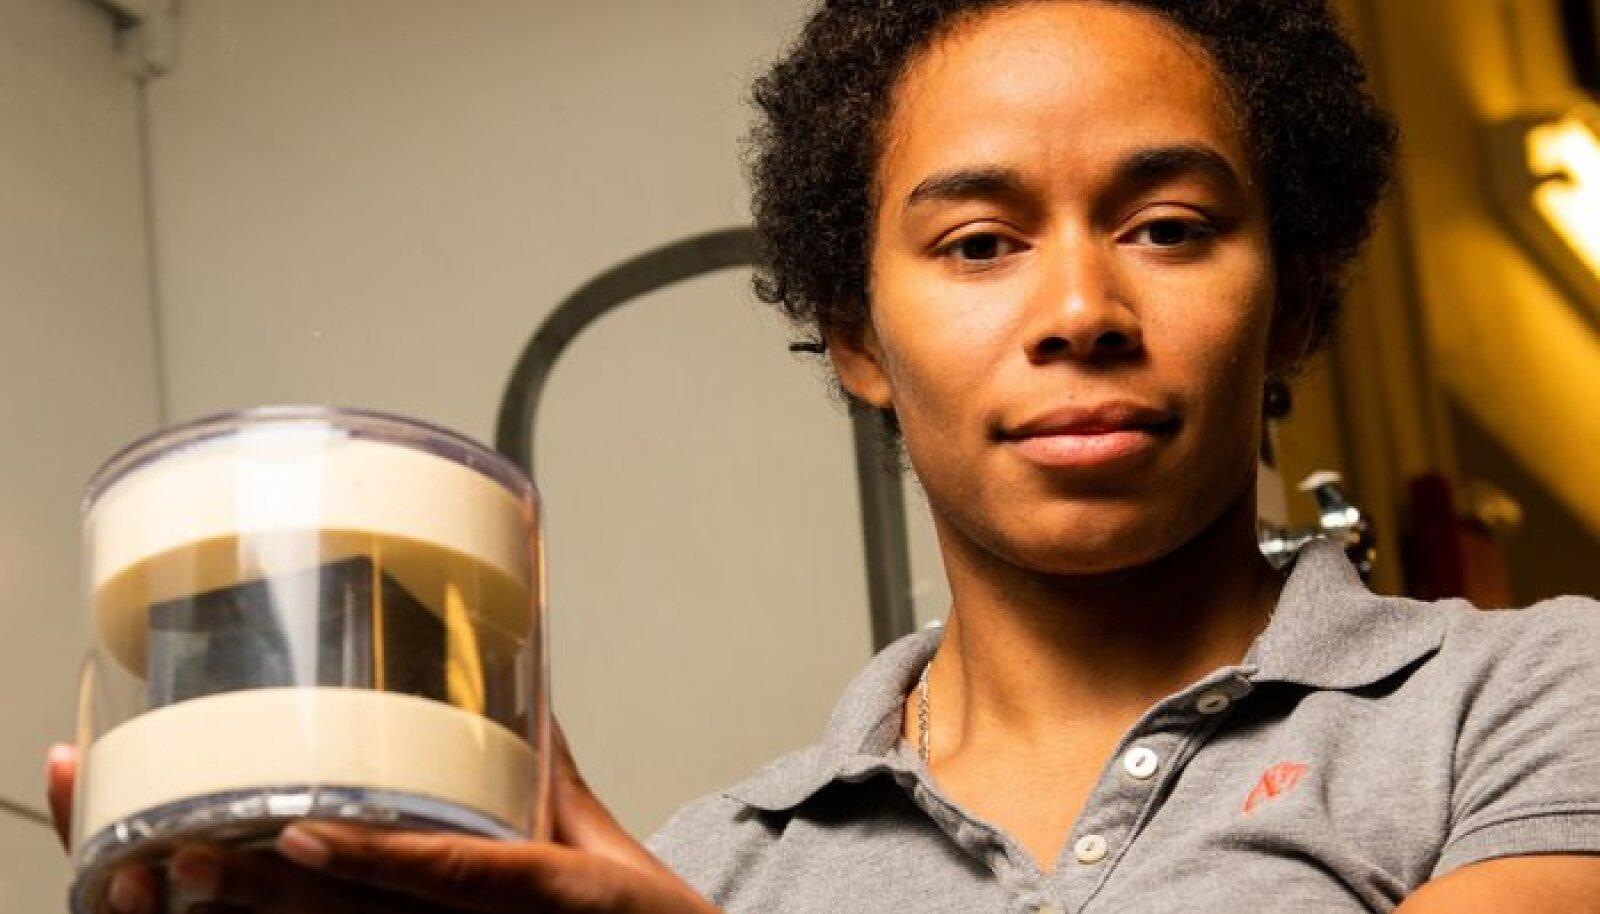 PNNL-i keemik Brittany Robertson salapärase päritoluga uraanikuubikut hoidmas (foto: Andrea Starr / PNNL)